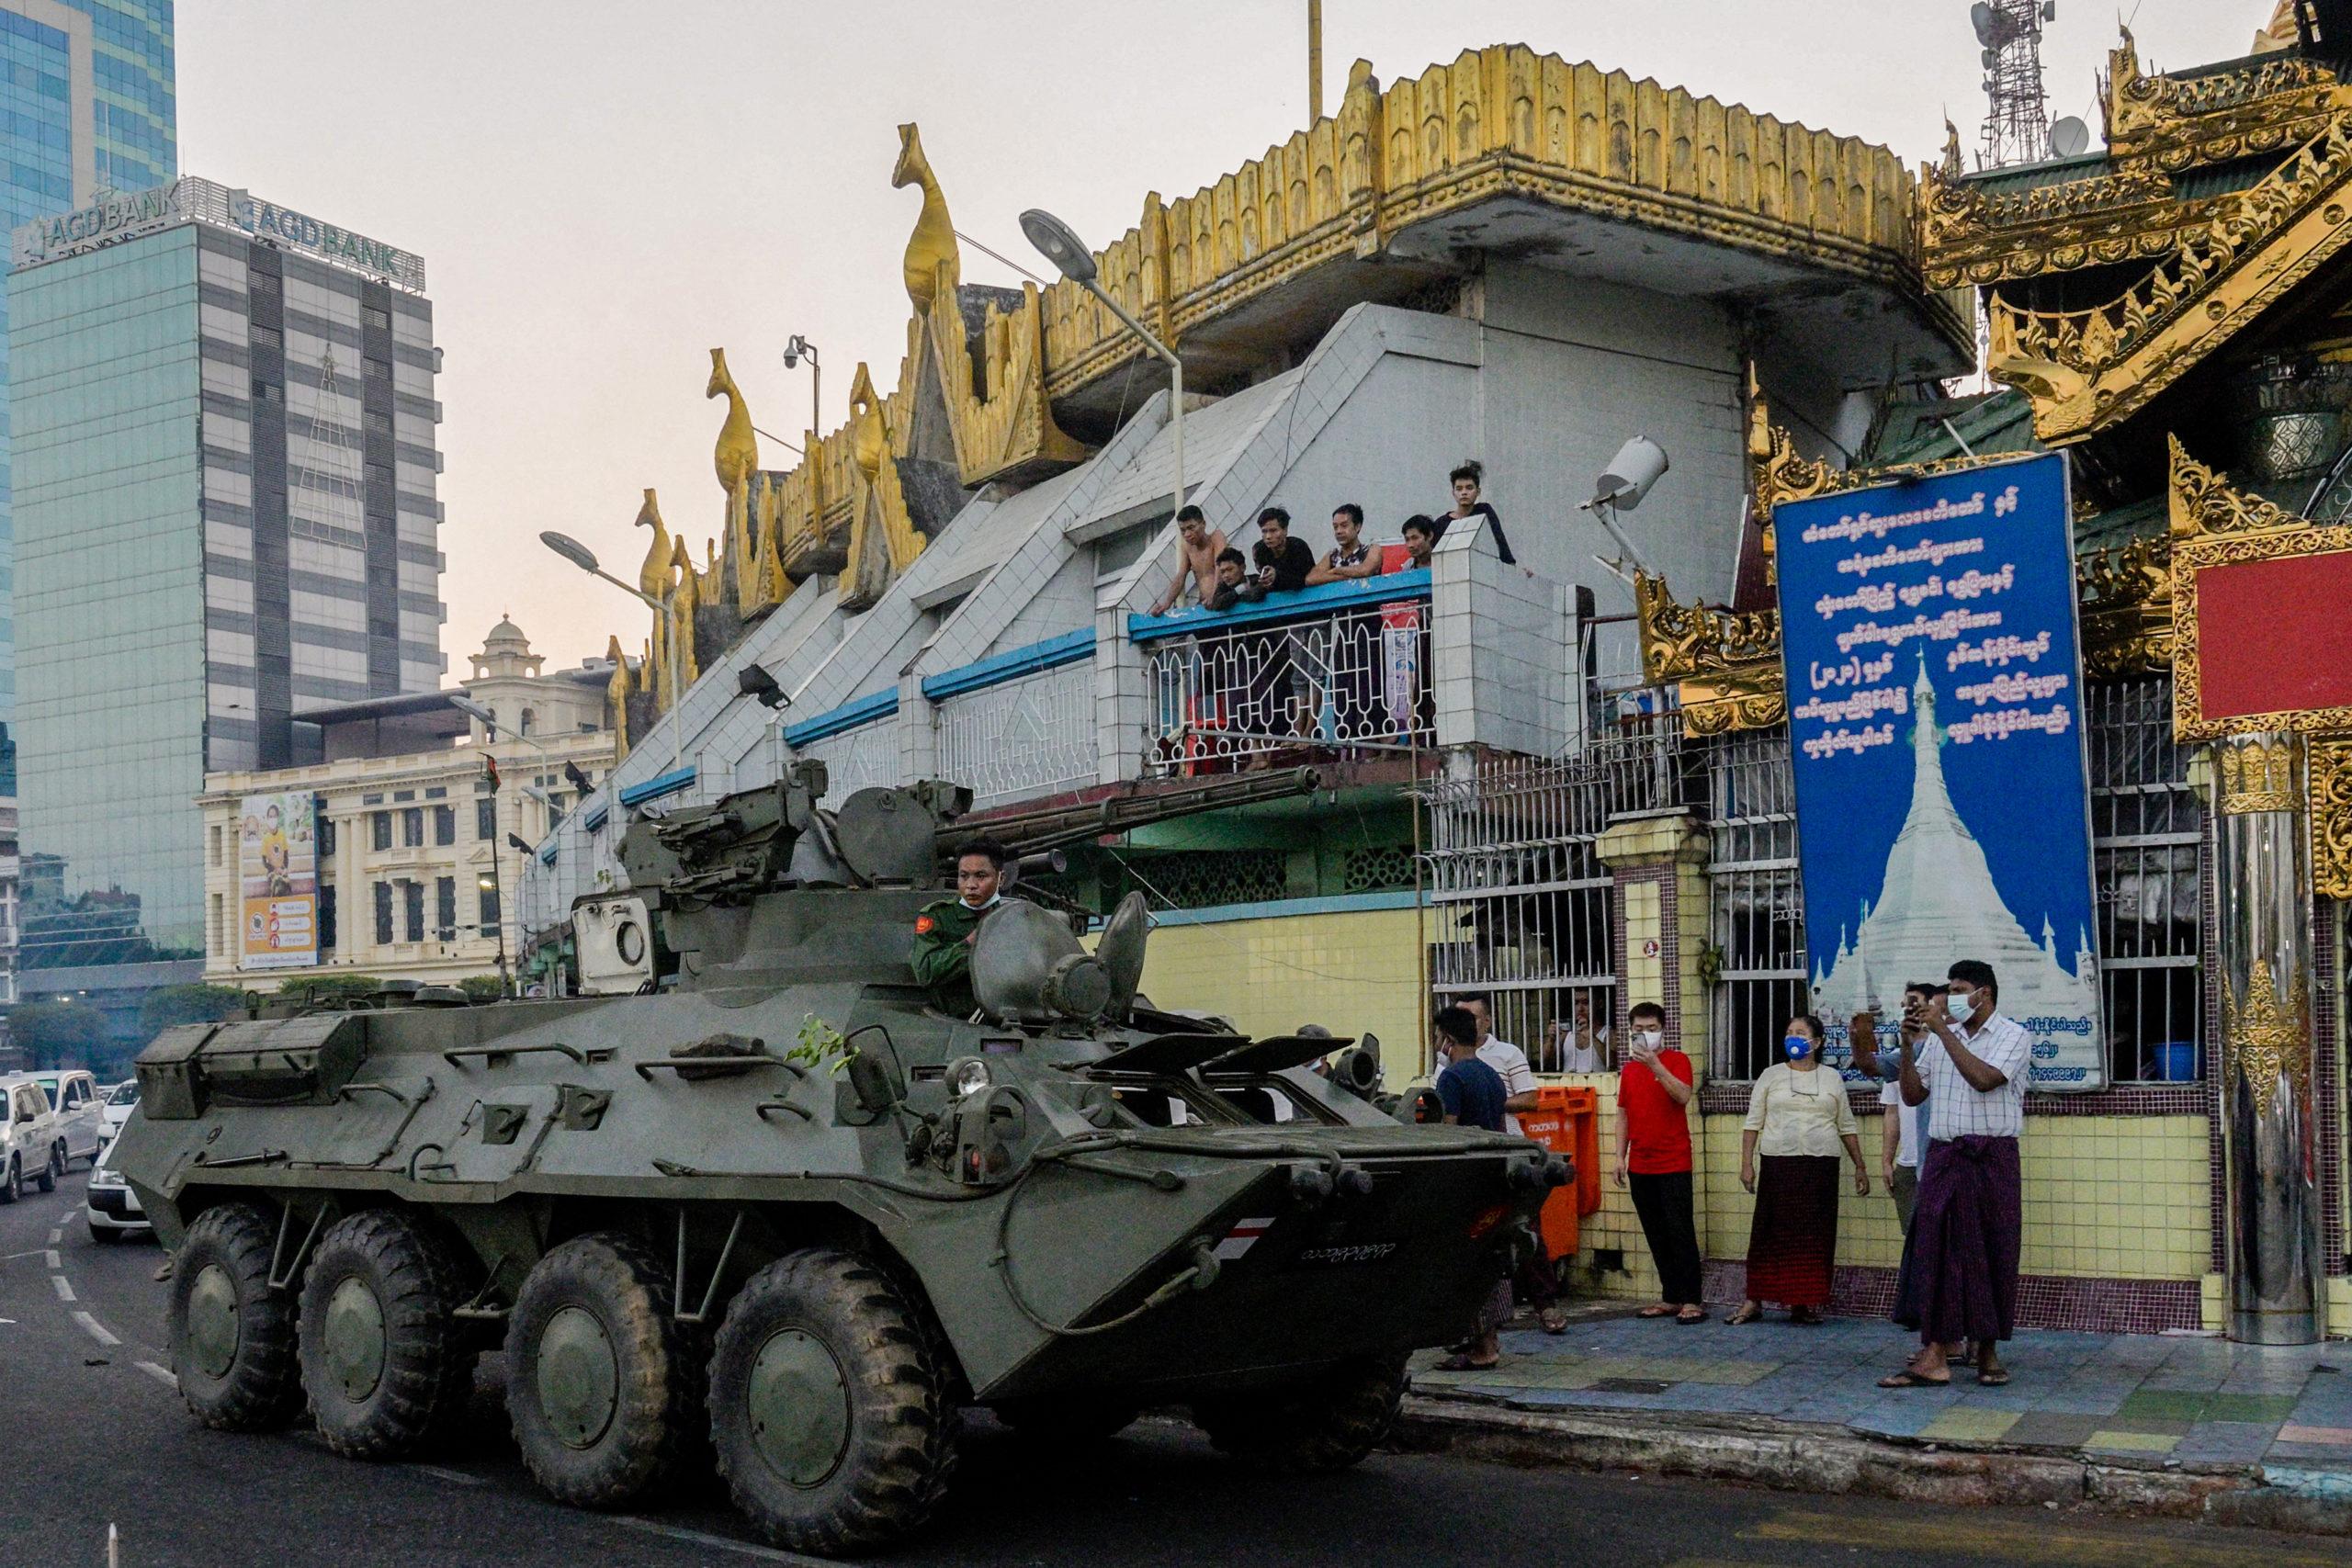 Protests after Myanmar junta cuts internet, deploys troops